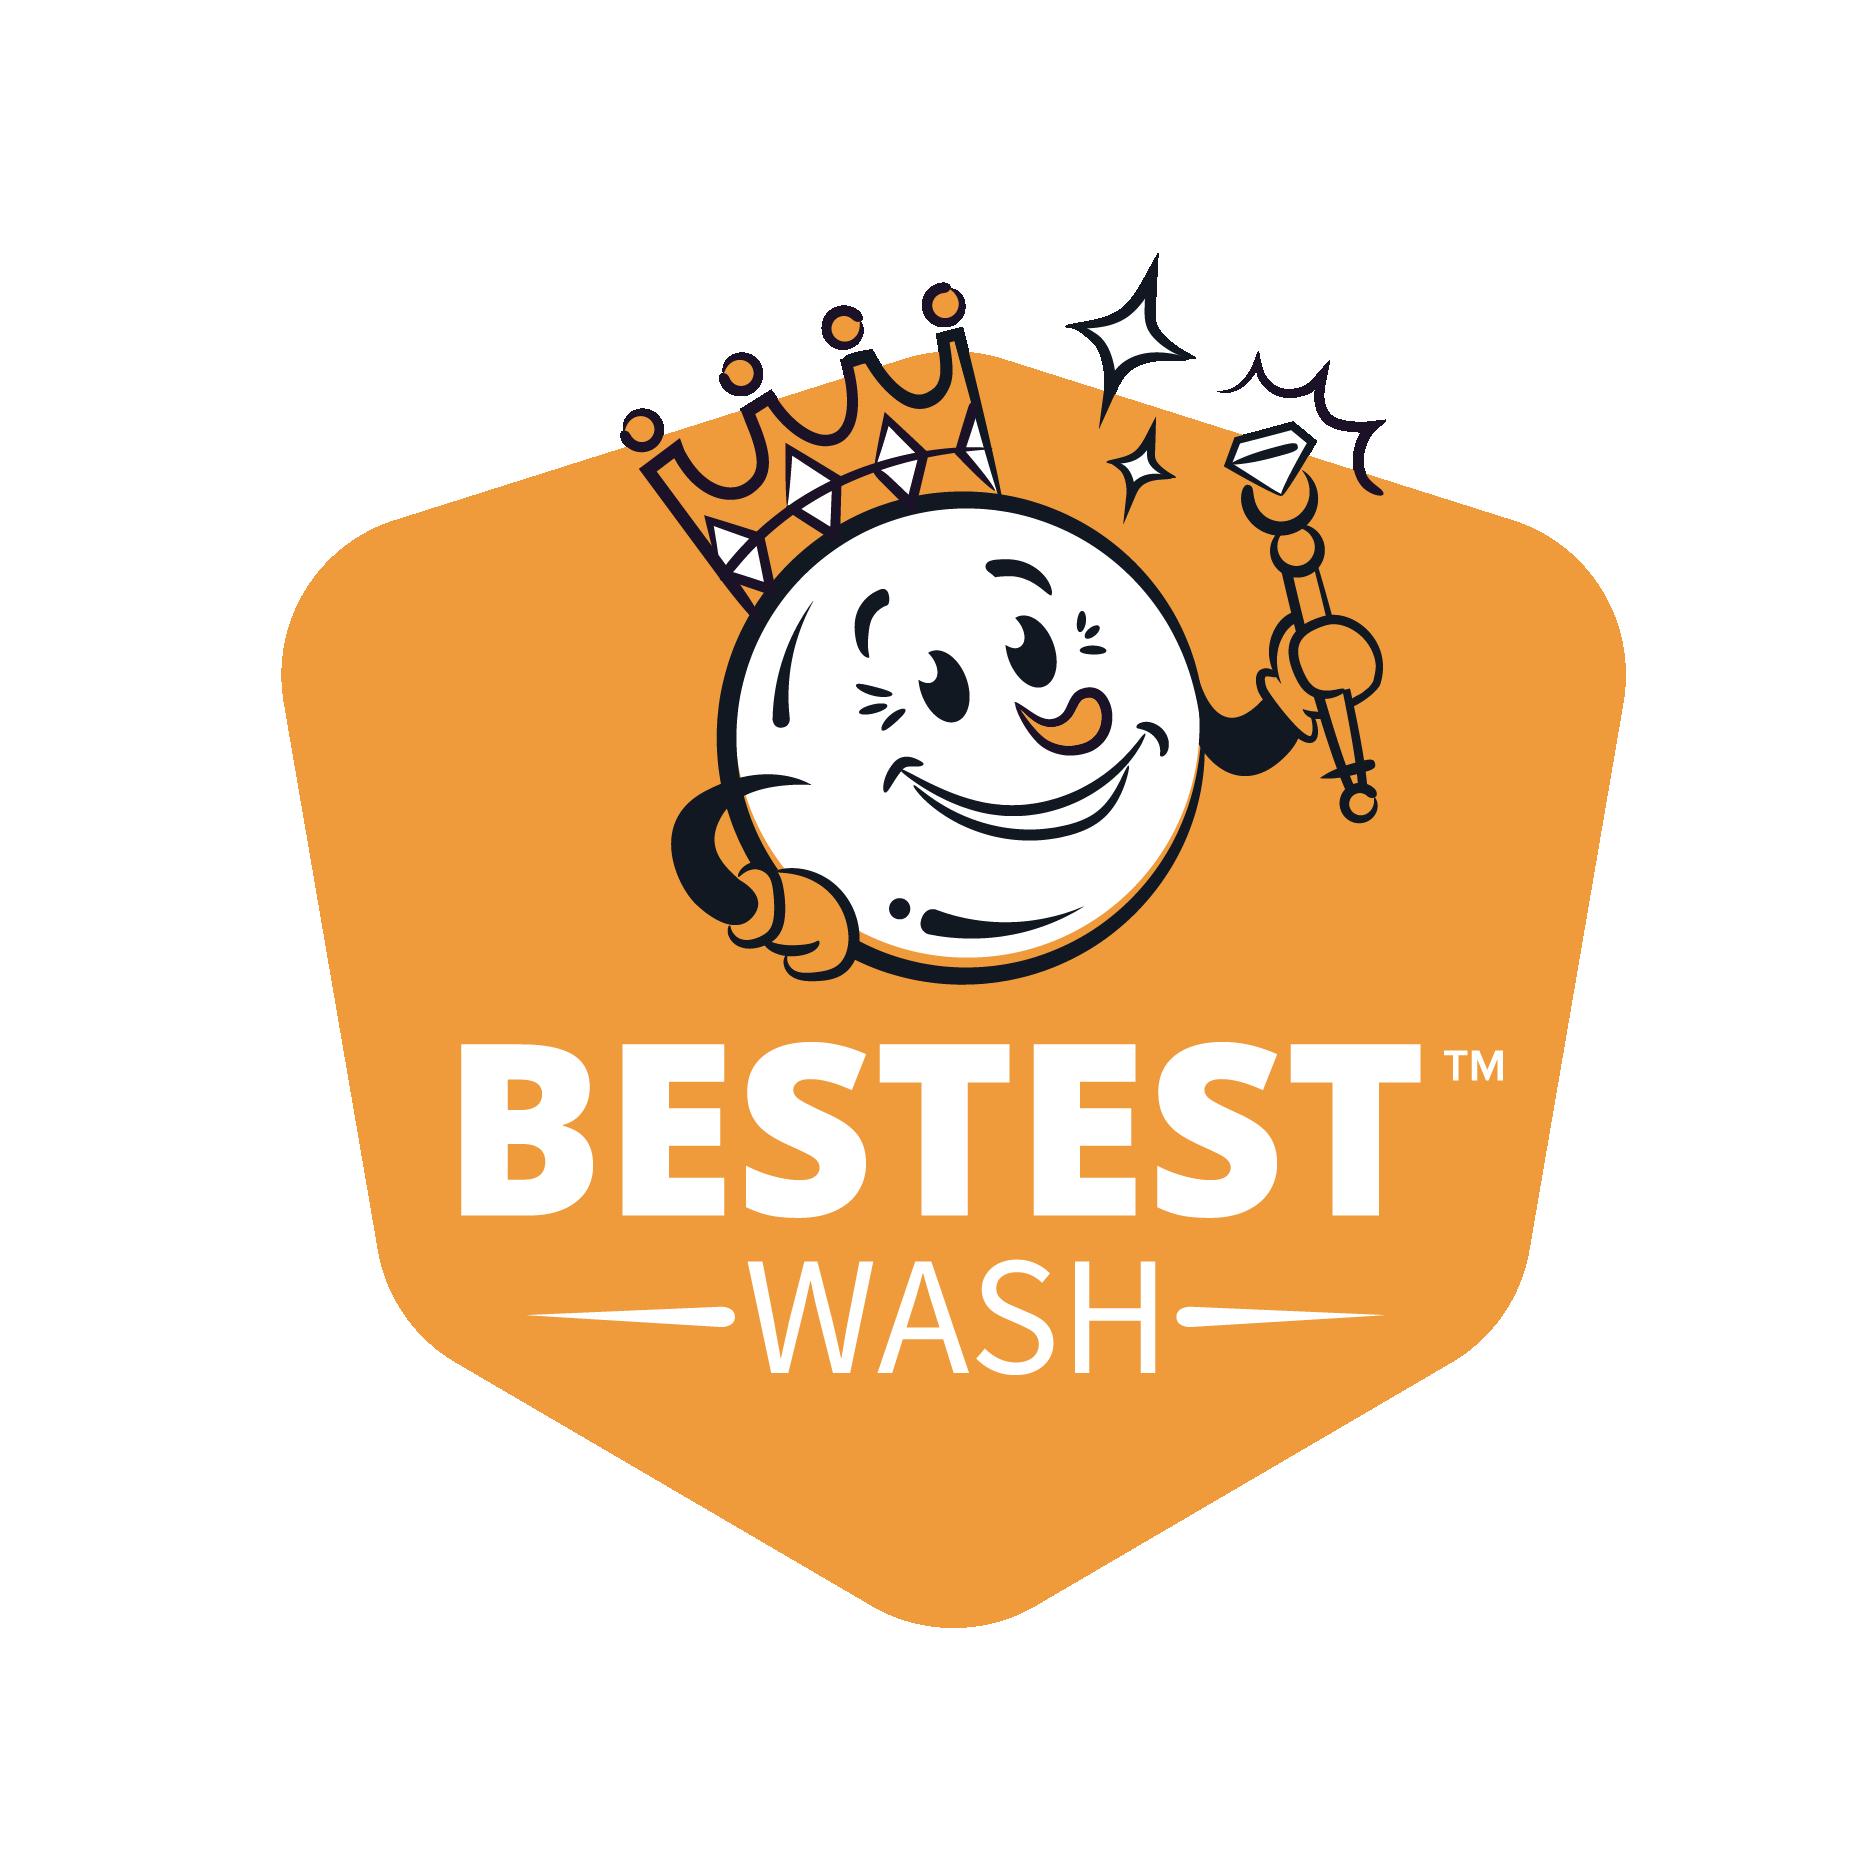 BD-wash-characters-04